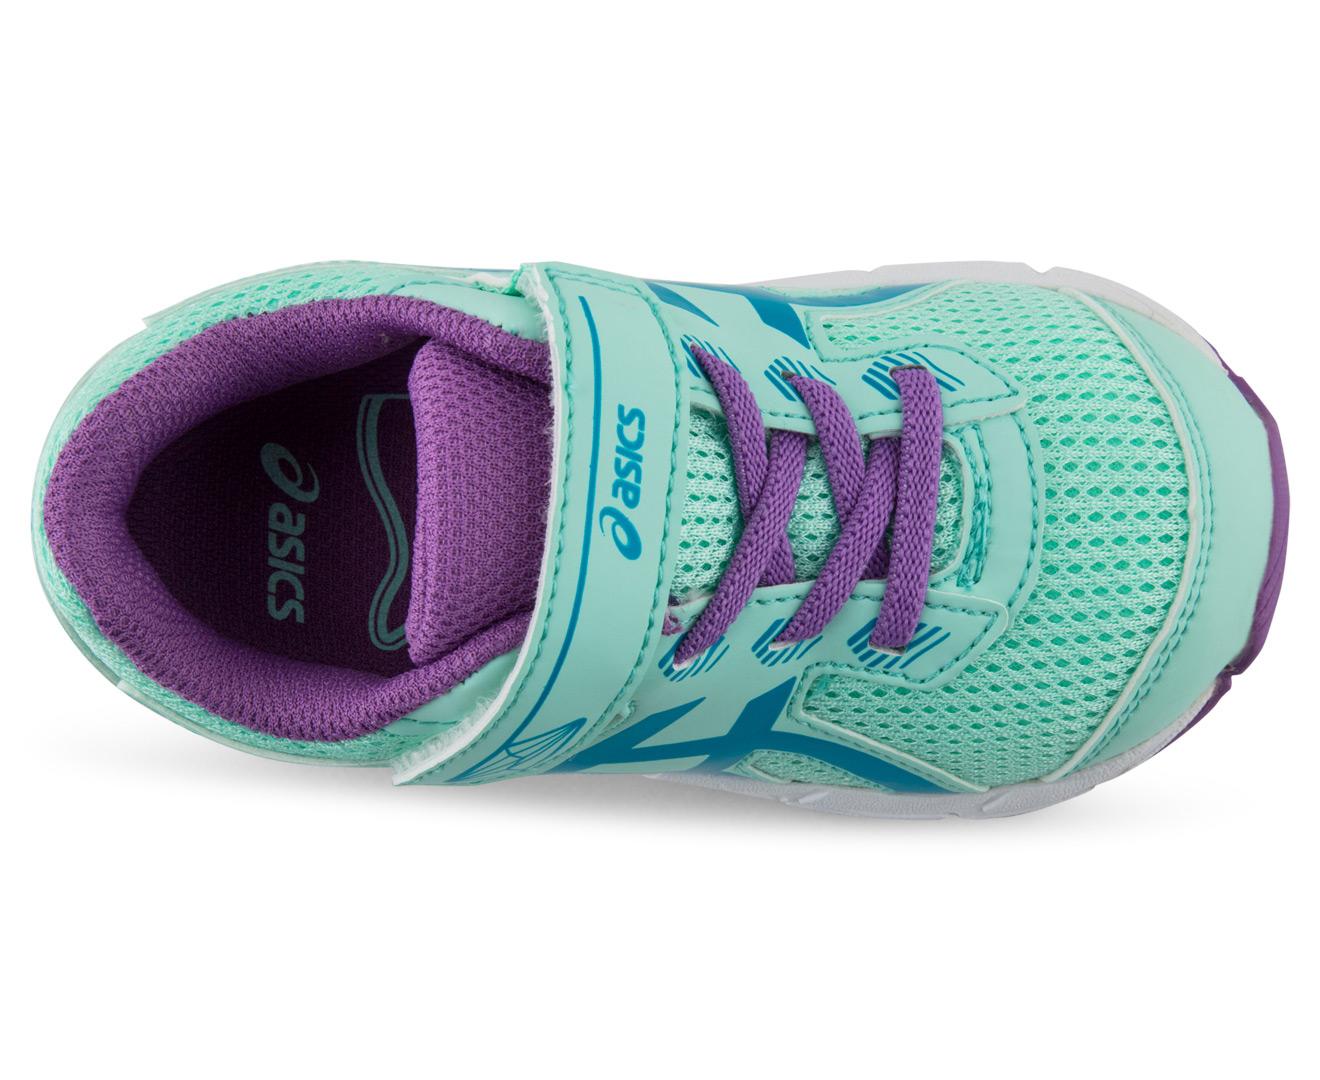 Asics Toddler Gt 1000 5 Ts Shoe Mint Blue Jewel Orchid